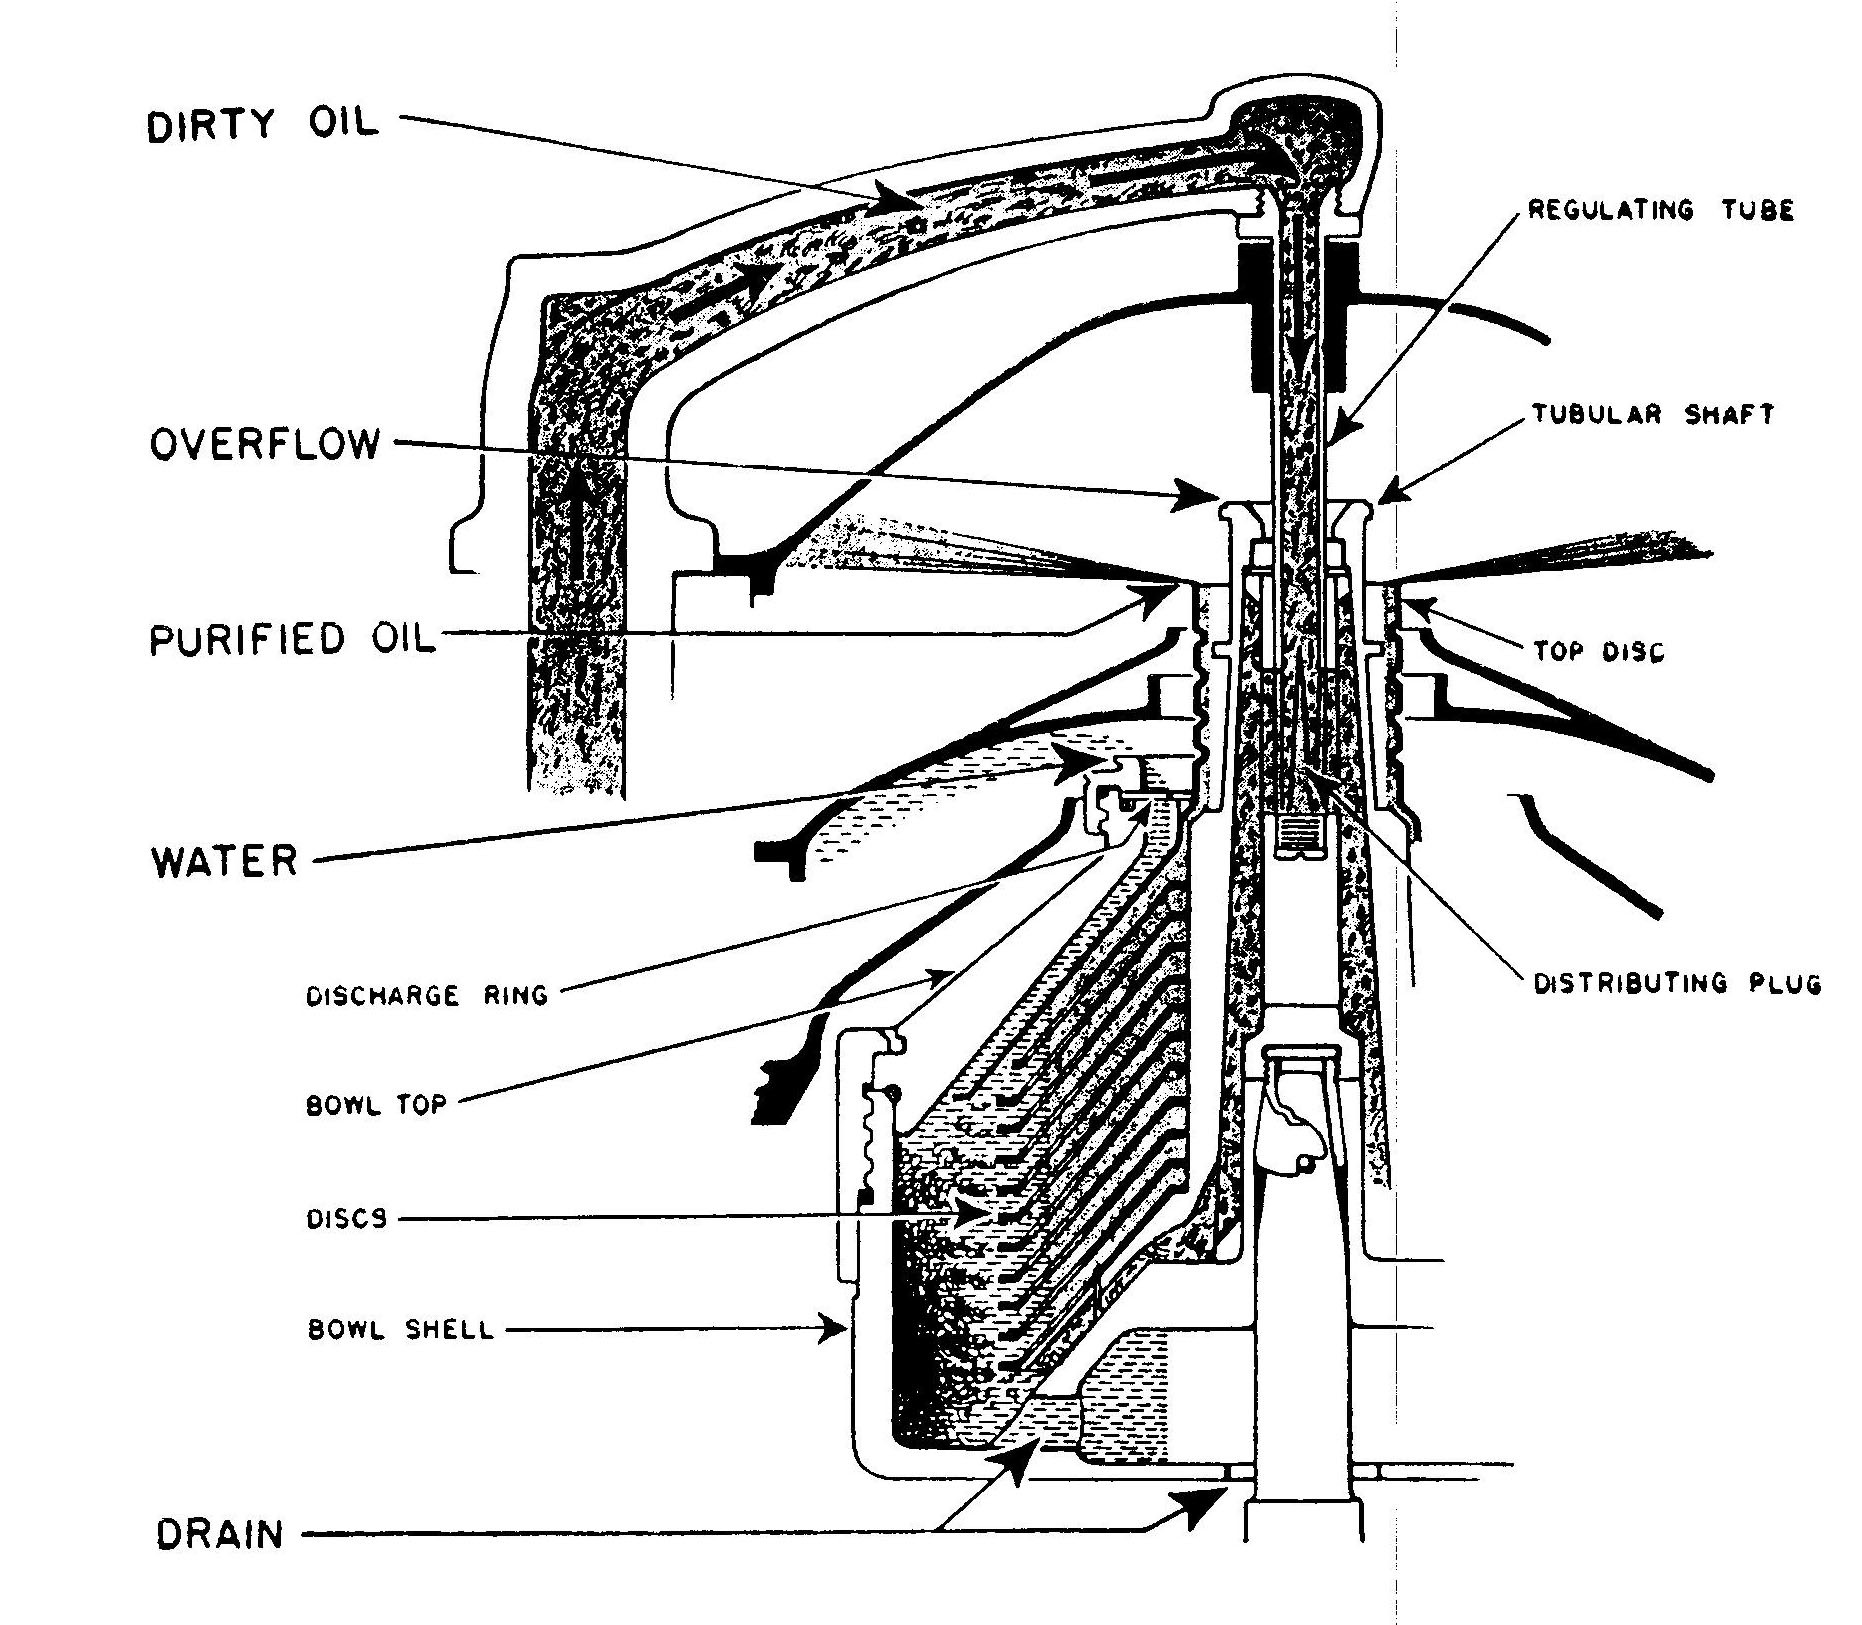 Lube Oil Diagram №181499000 Tsps Engineering Manual Of Lube Oil Diagram №181499000